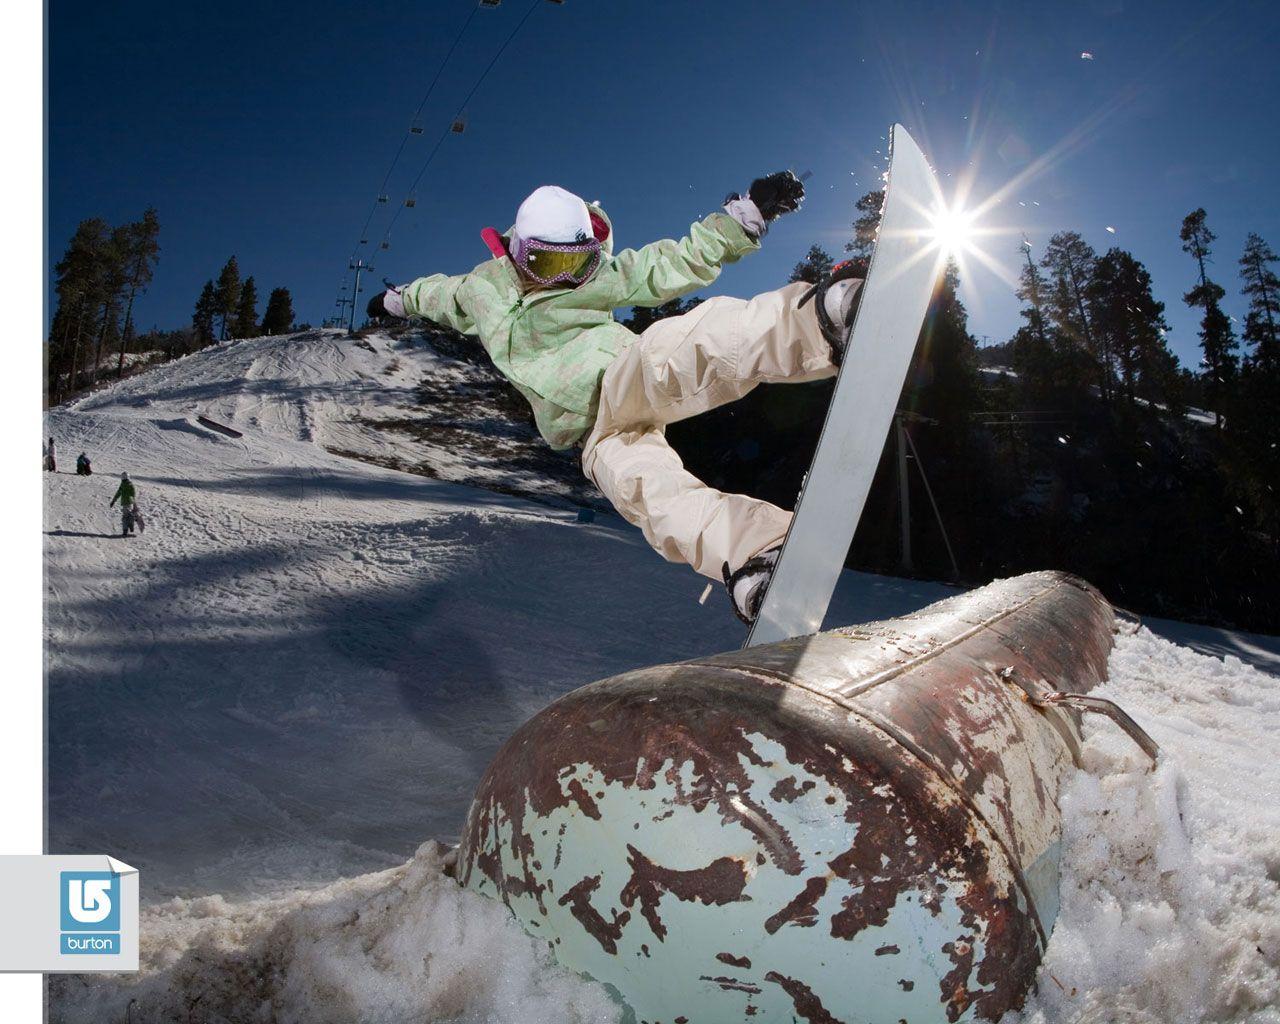 Snowboard Hd Wallpaper Sf Wallpaper